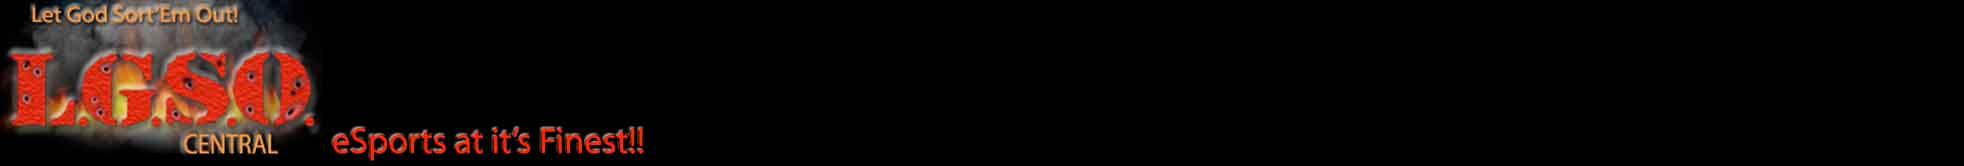 LGSOCENTRAL